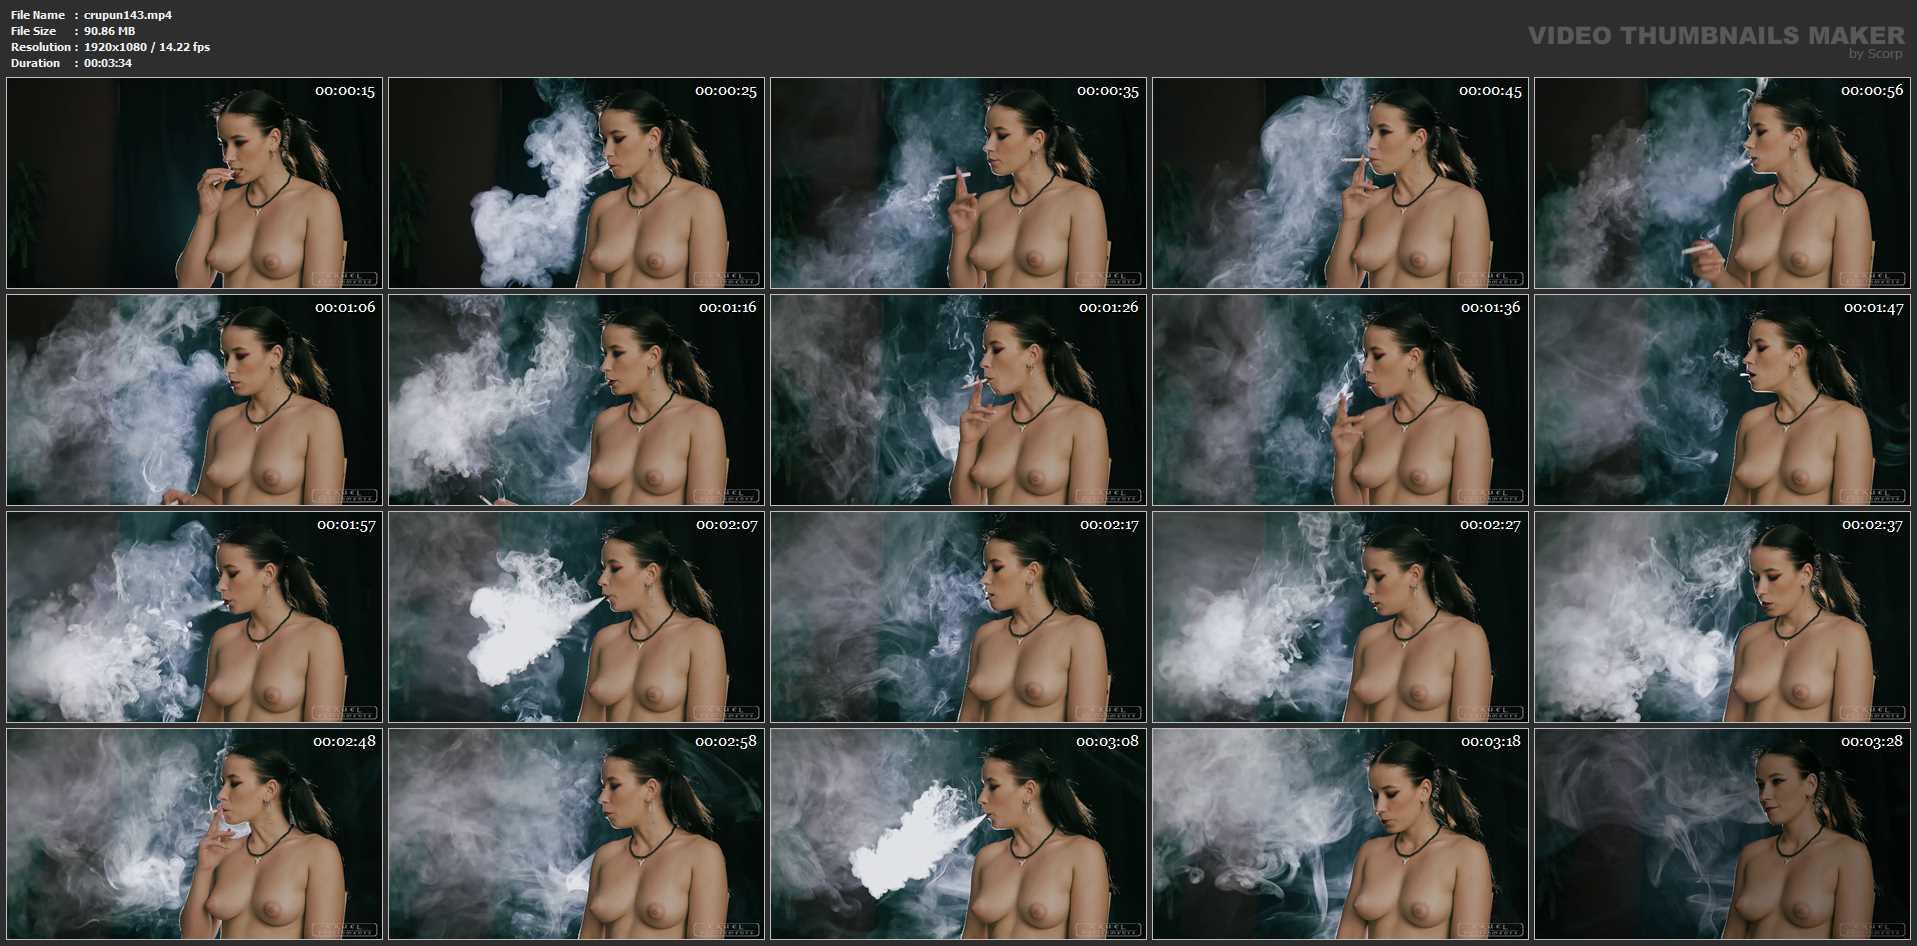 Mistress Anette In Scene: Smoking in the break - CRUEL PUNISHMENTS - SEVERE FEMDOM - FULL HD/1080p/MP4